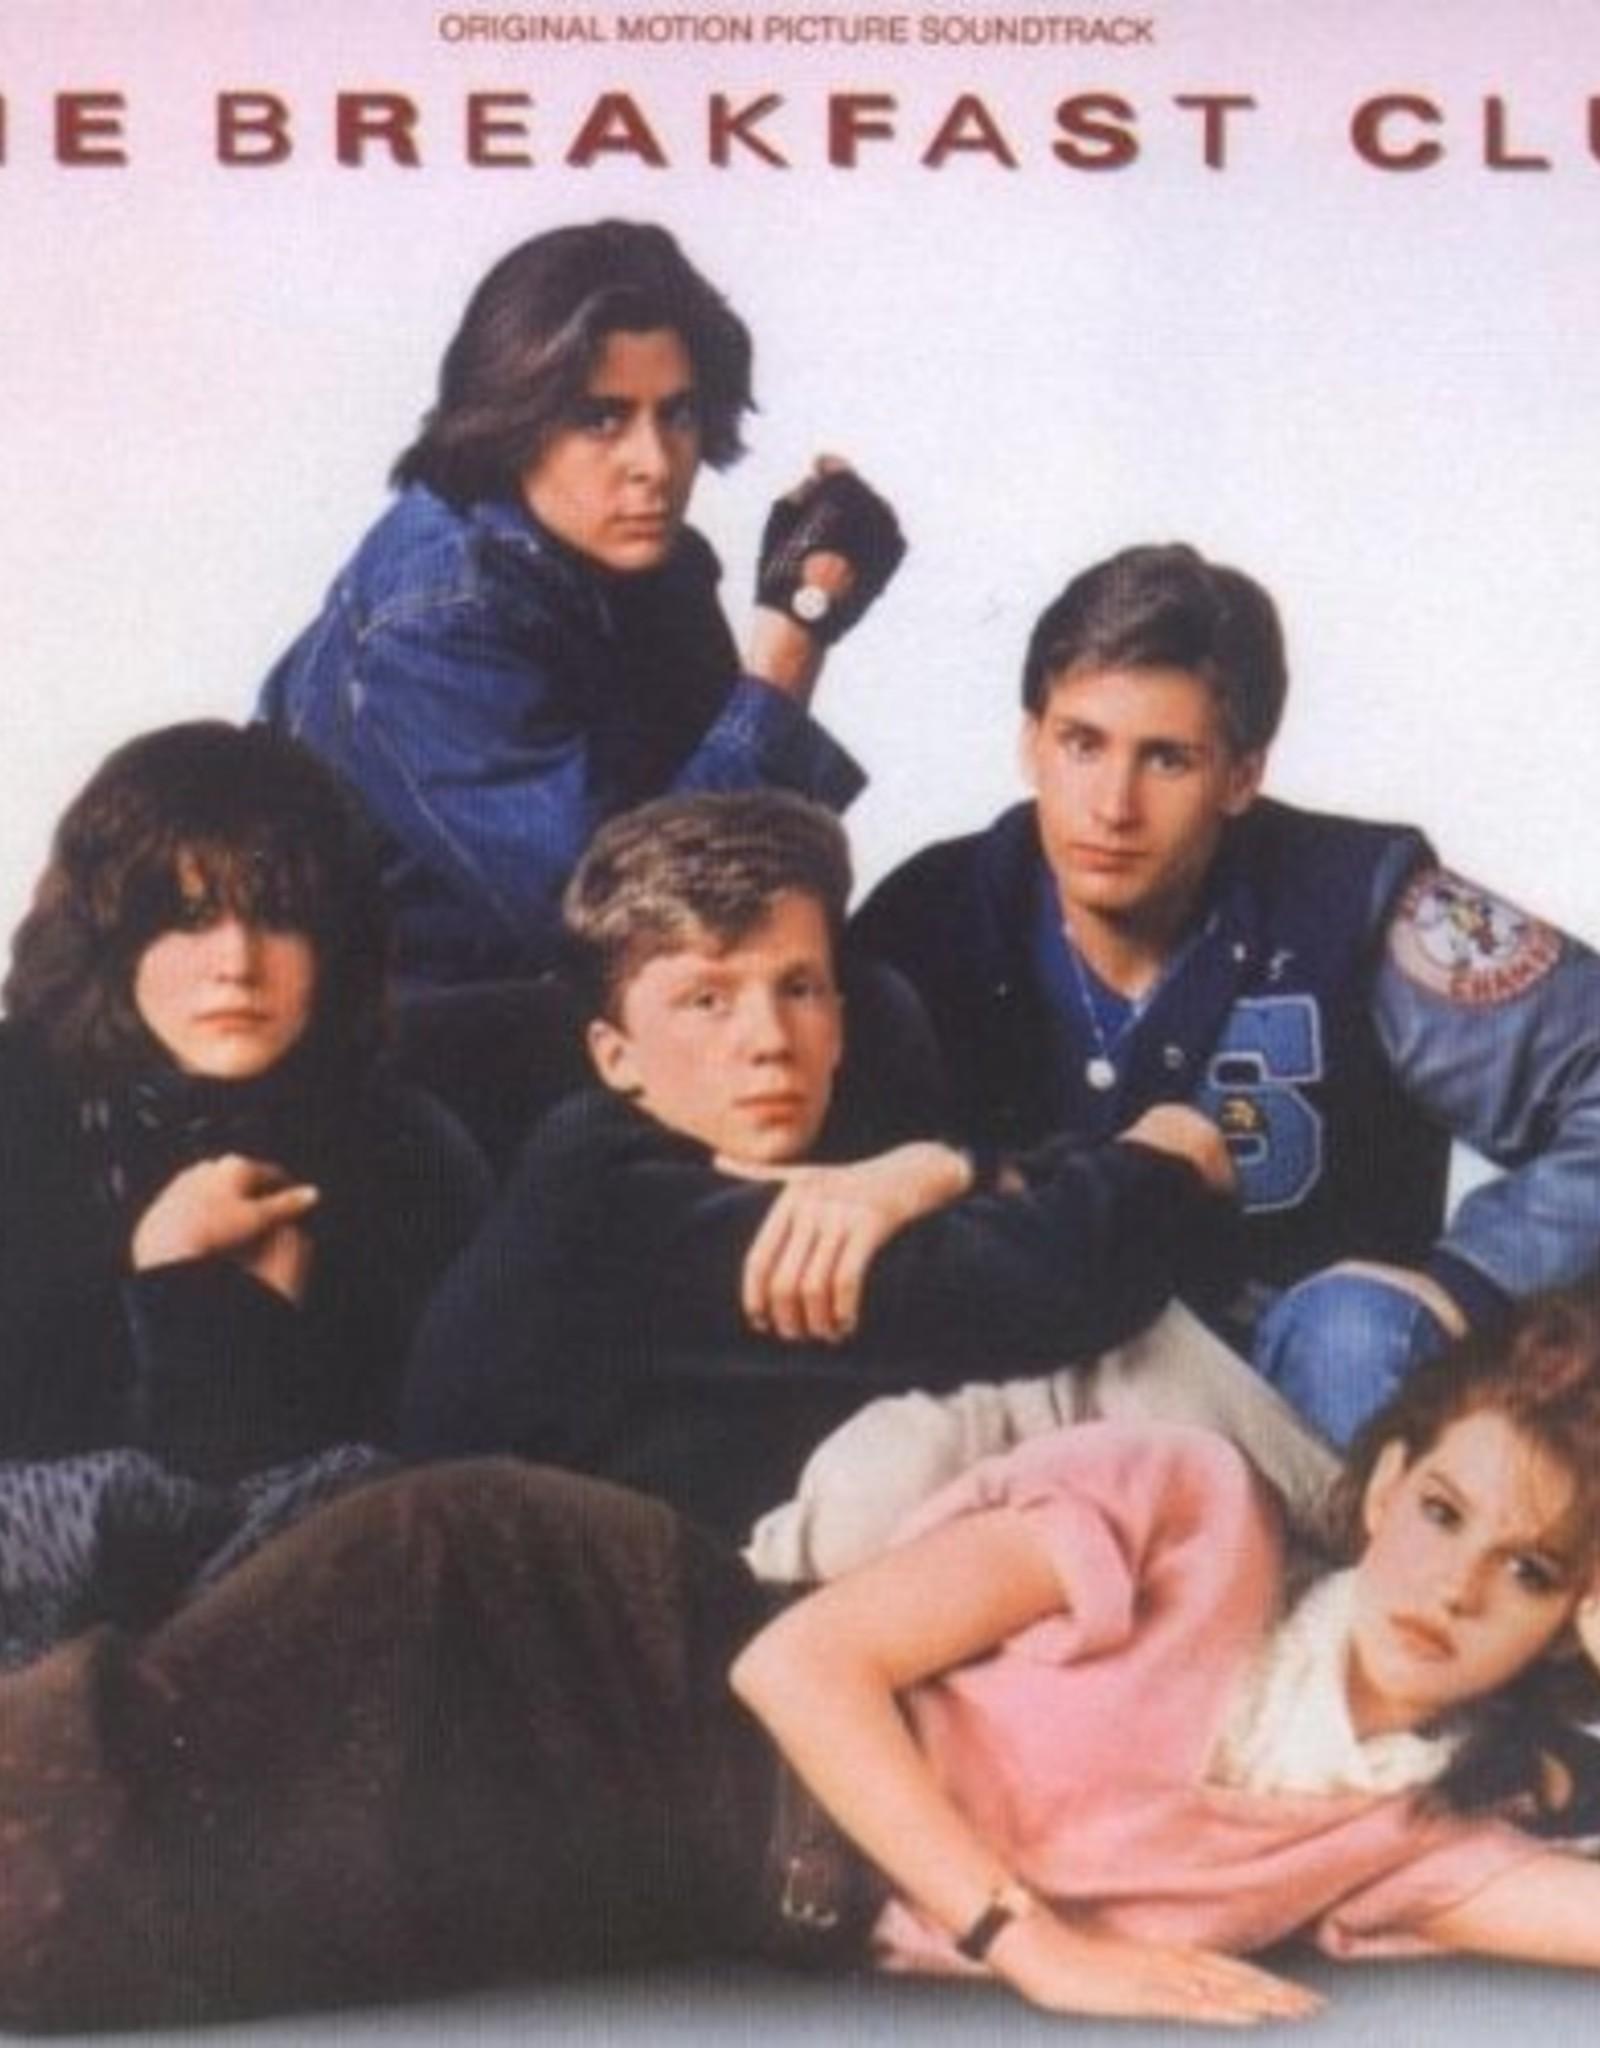 Breakfast Club - Original Motion Picture Soundtr